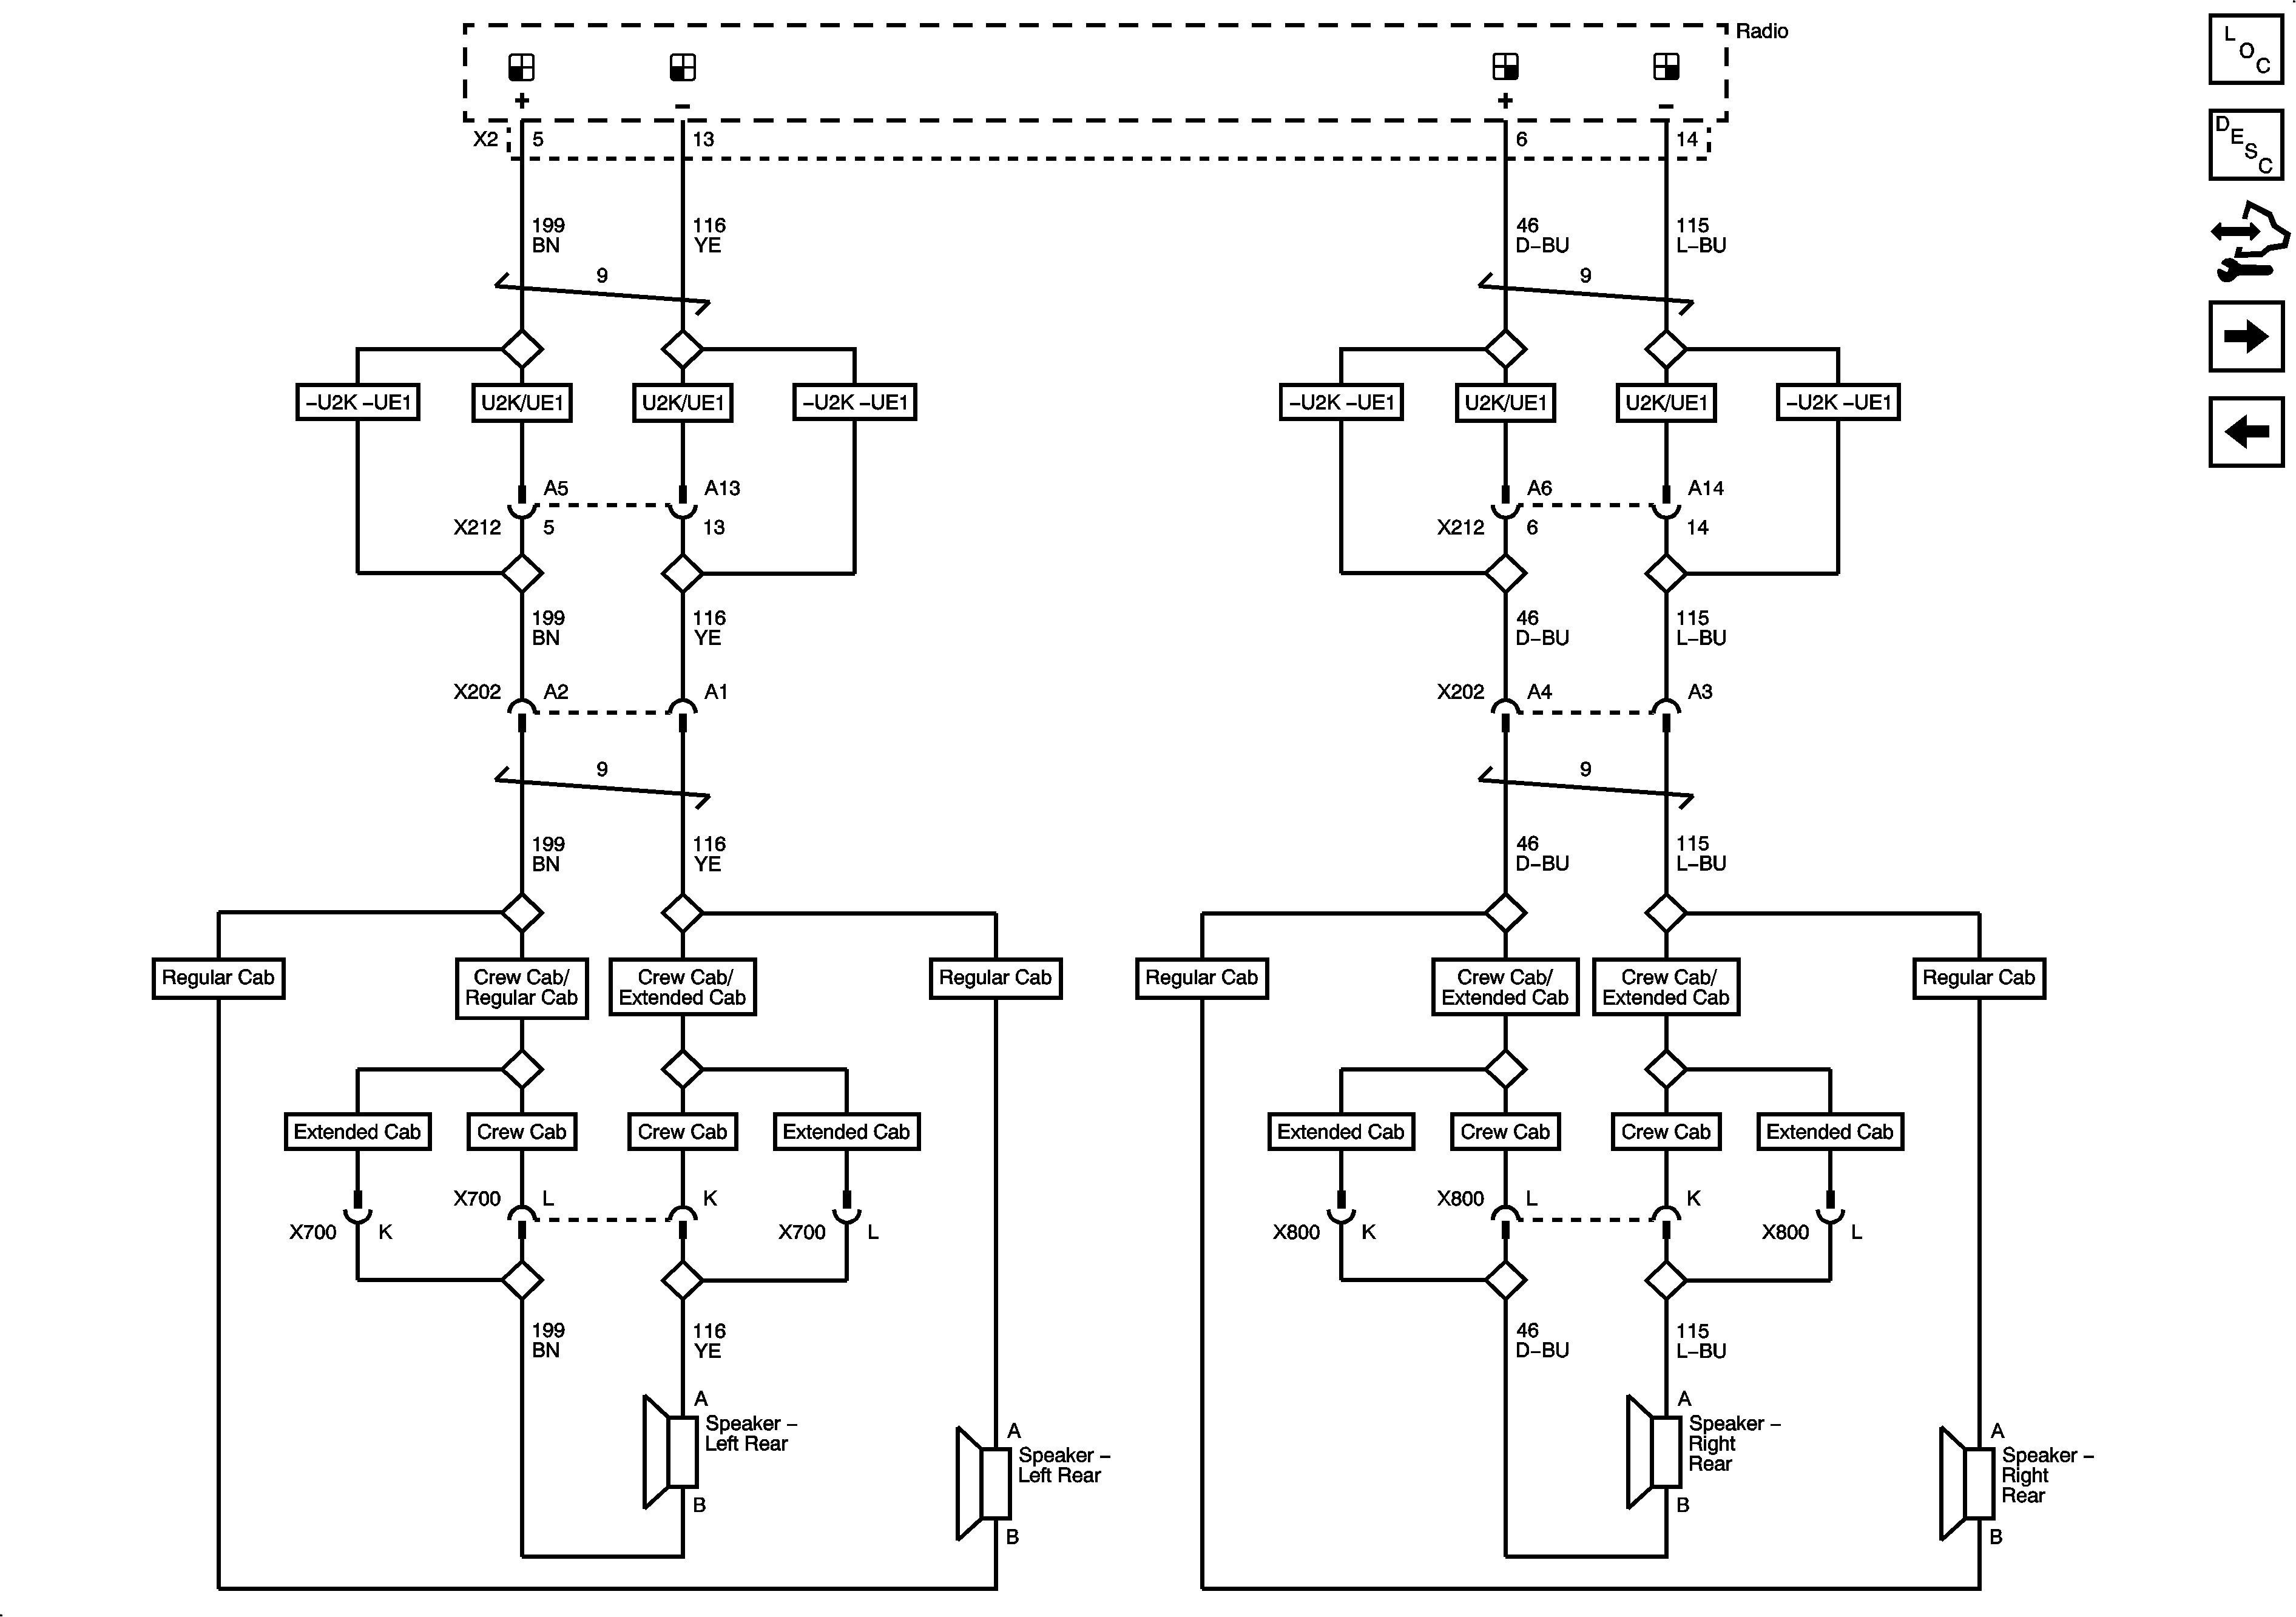 2008 Chevy Impala Wiring Diagram 2008 Chevy Impala Radio Wiring Diagram Download Of 2008 Chevy Impala Wiring Diagram 2010 Chevy Impala Wiring Diagram Trusted Wiring Diagram